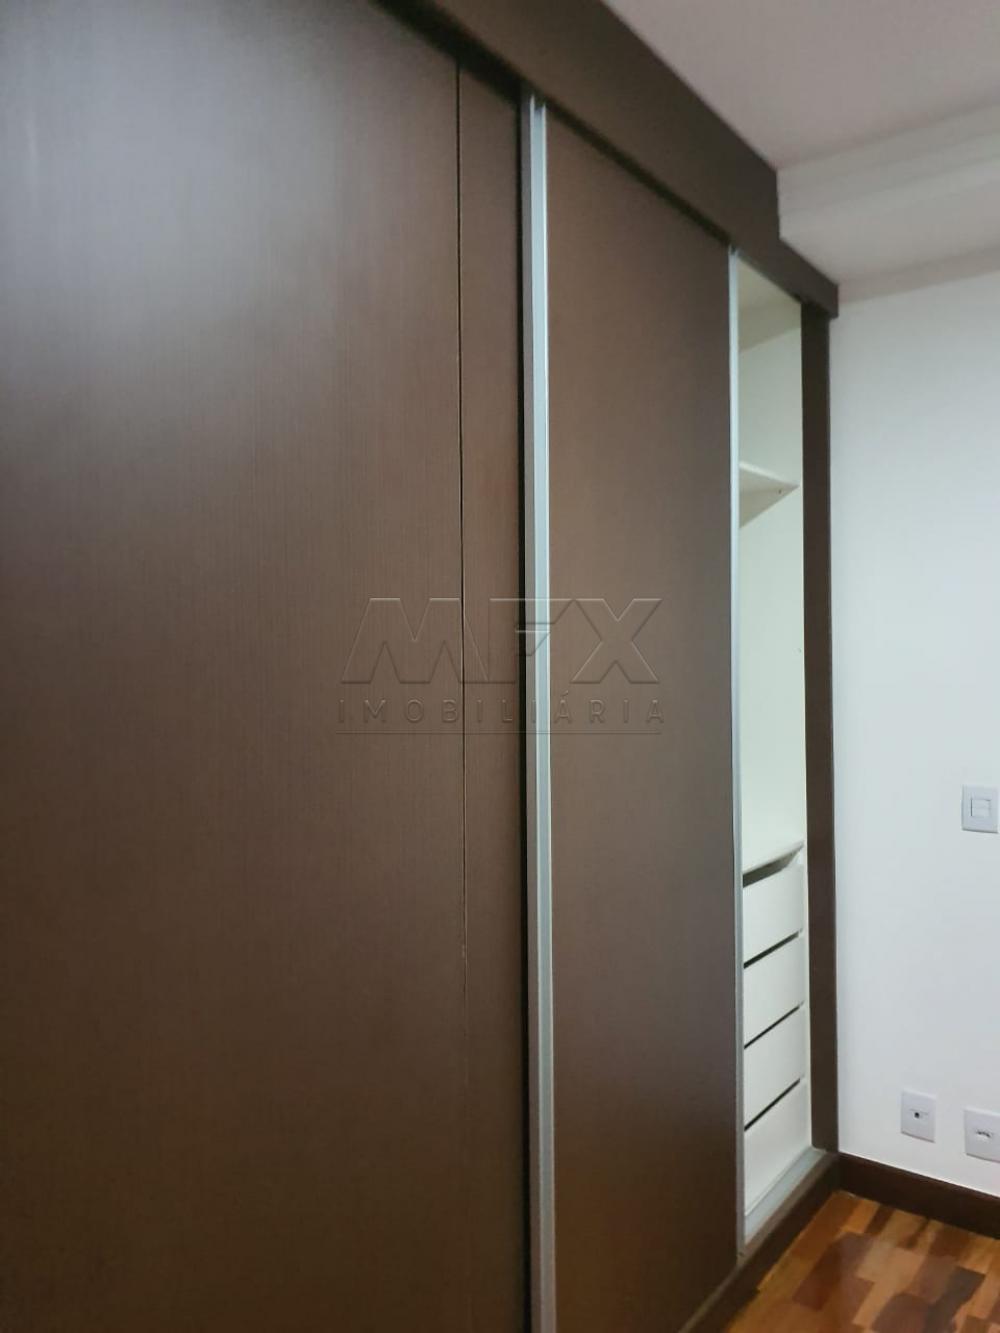 Alugar Casa / Condomínio em Bauru apenas R$ 6.800,00 - Foto 9